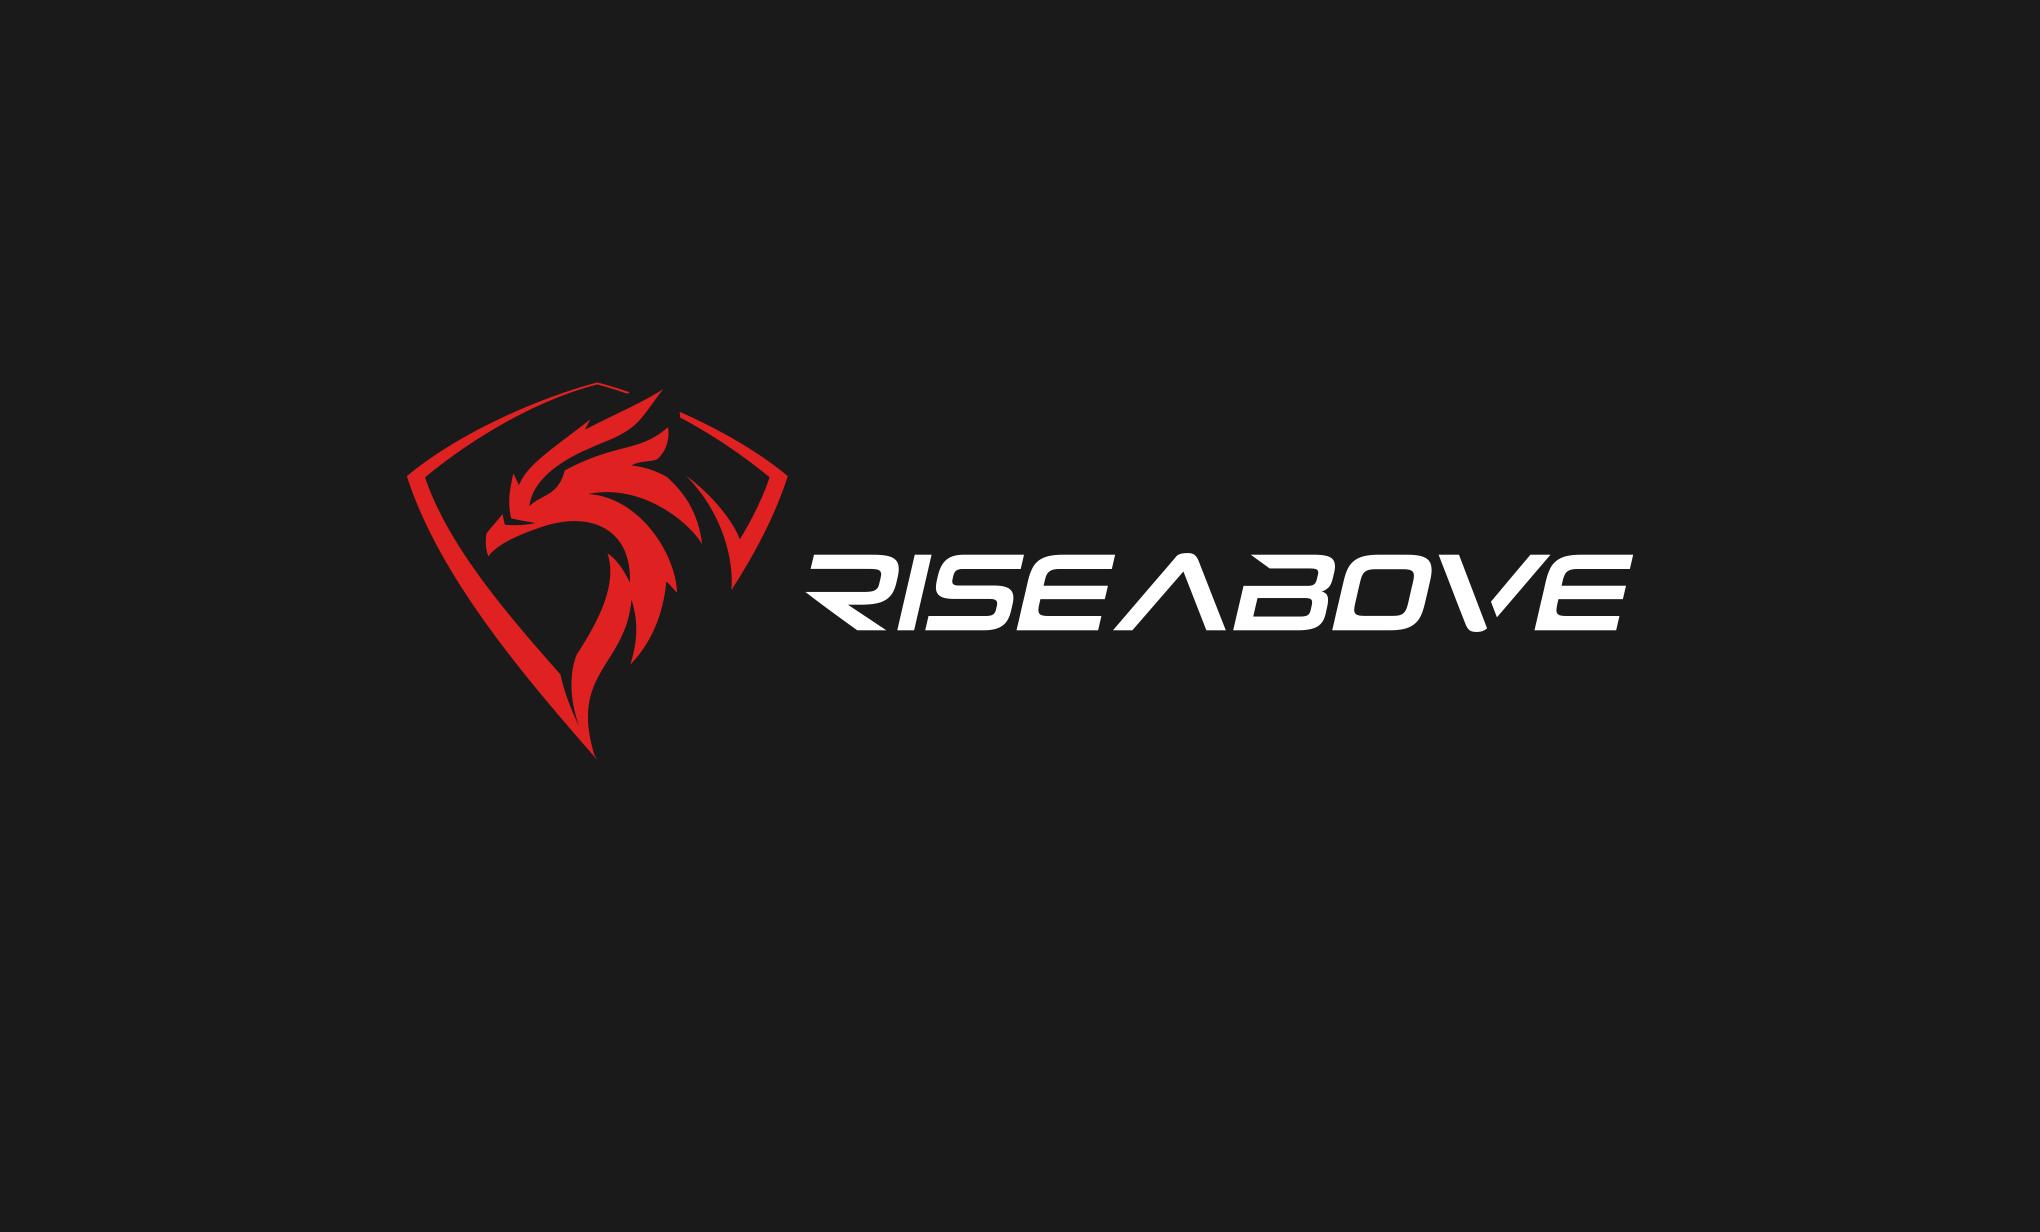 RISEABOVE fitness brand needs powerful logo